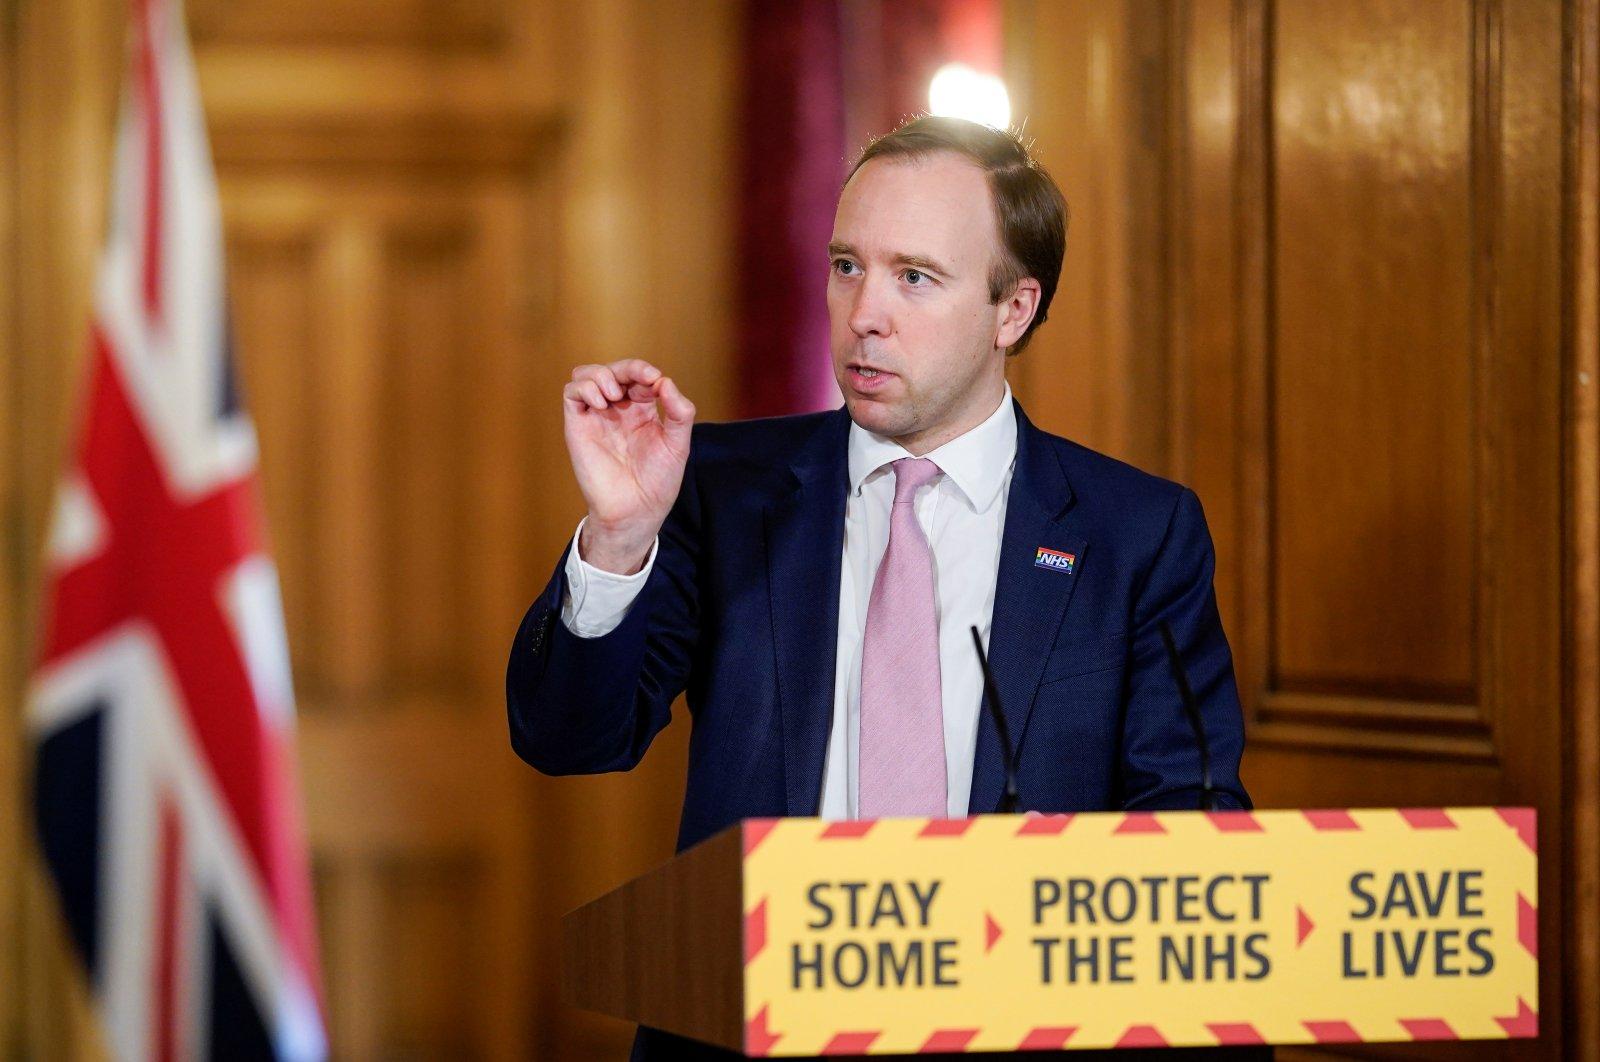 Britain's Health Secretary Matt Hancock chairs the Daily COVID-19 Digital News Conference at 10 Downing Street in London, Britain May 4, 2020. (REUTERS Photo)